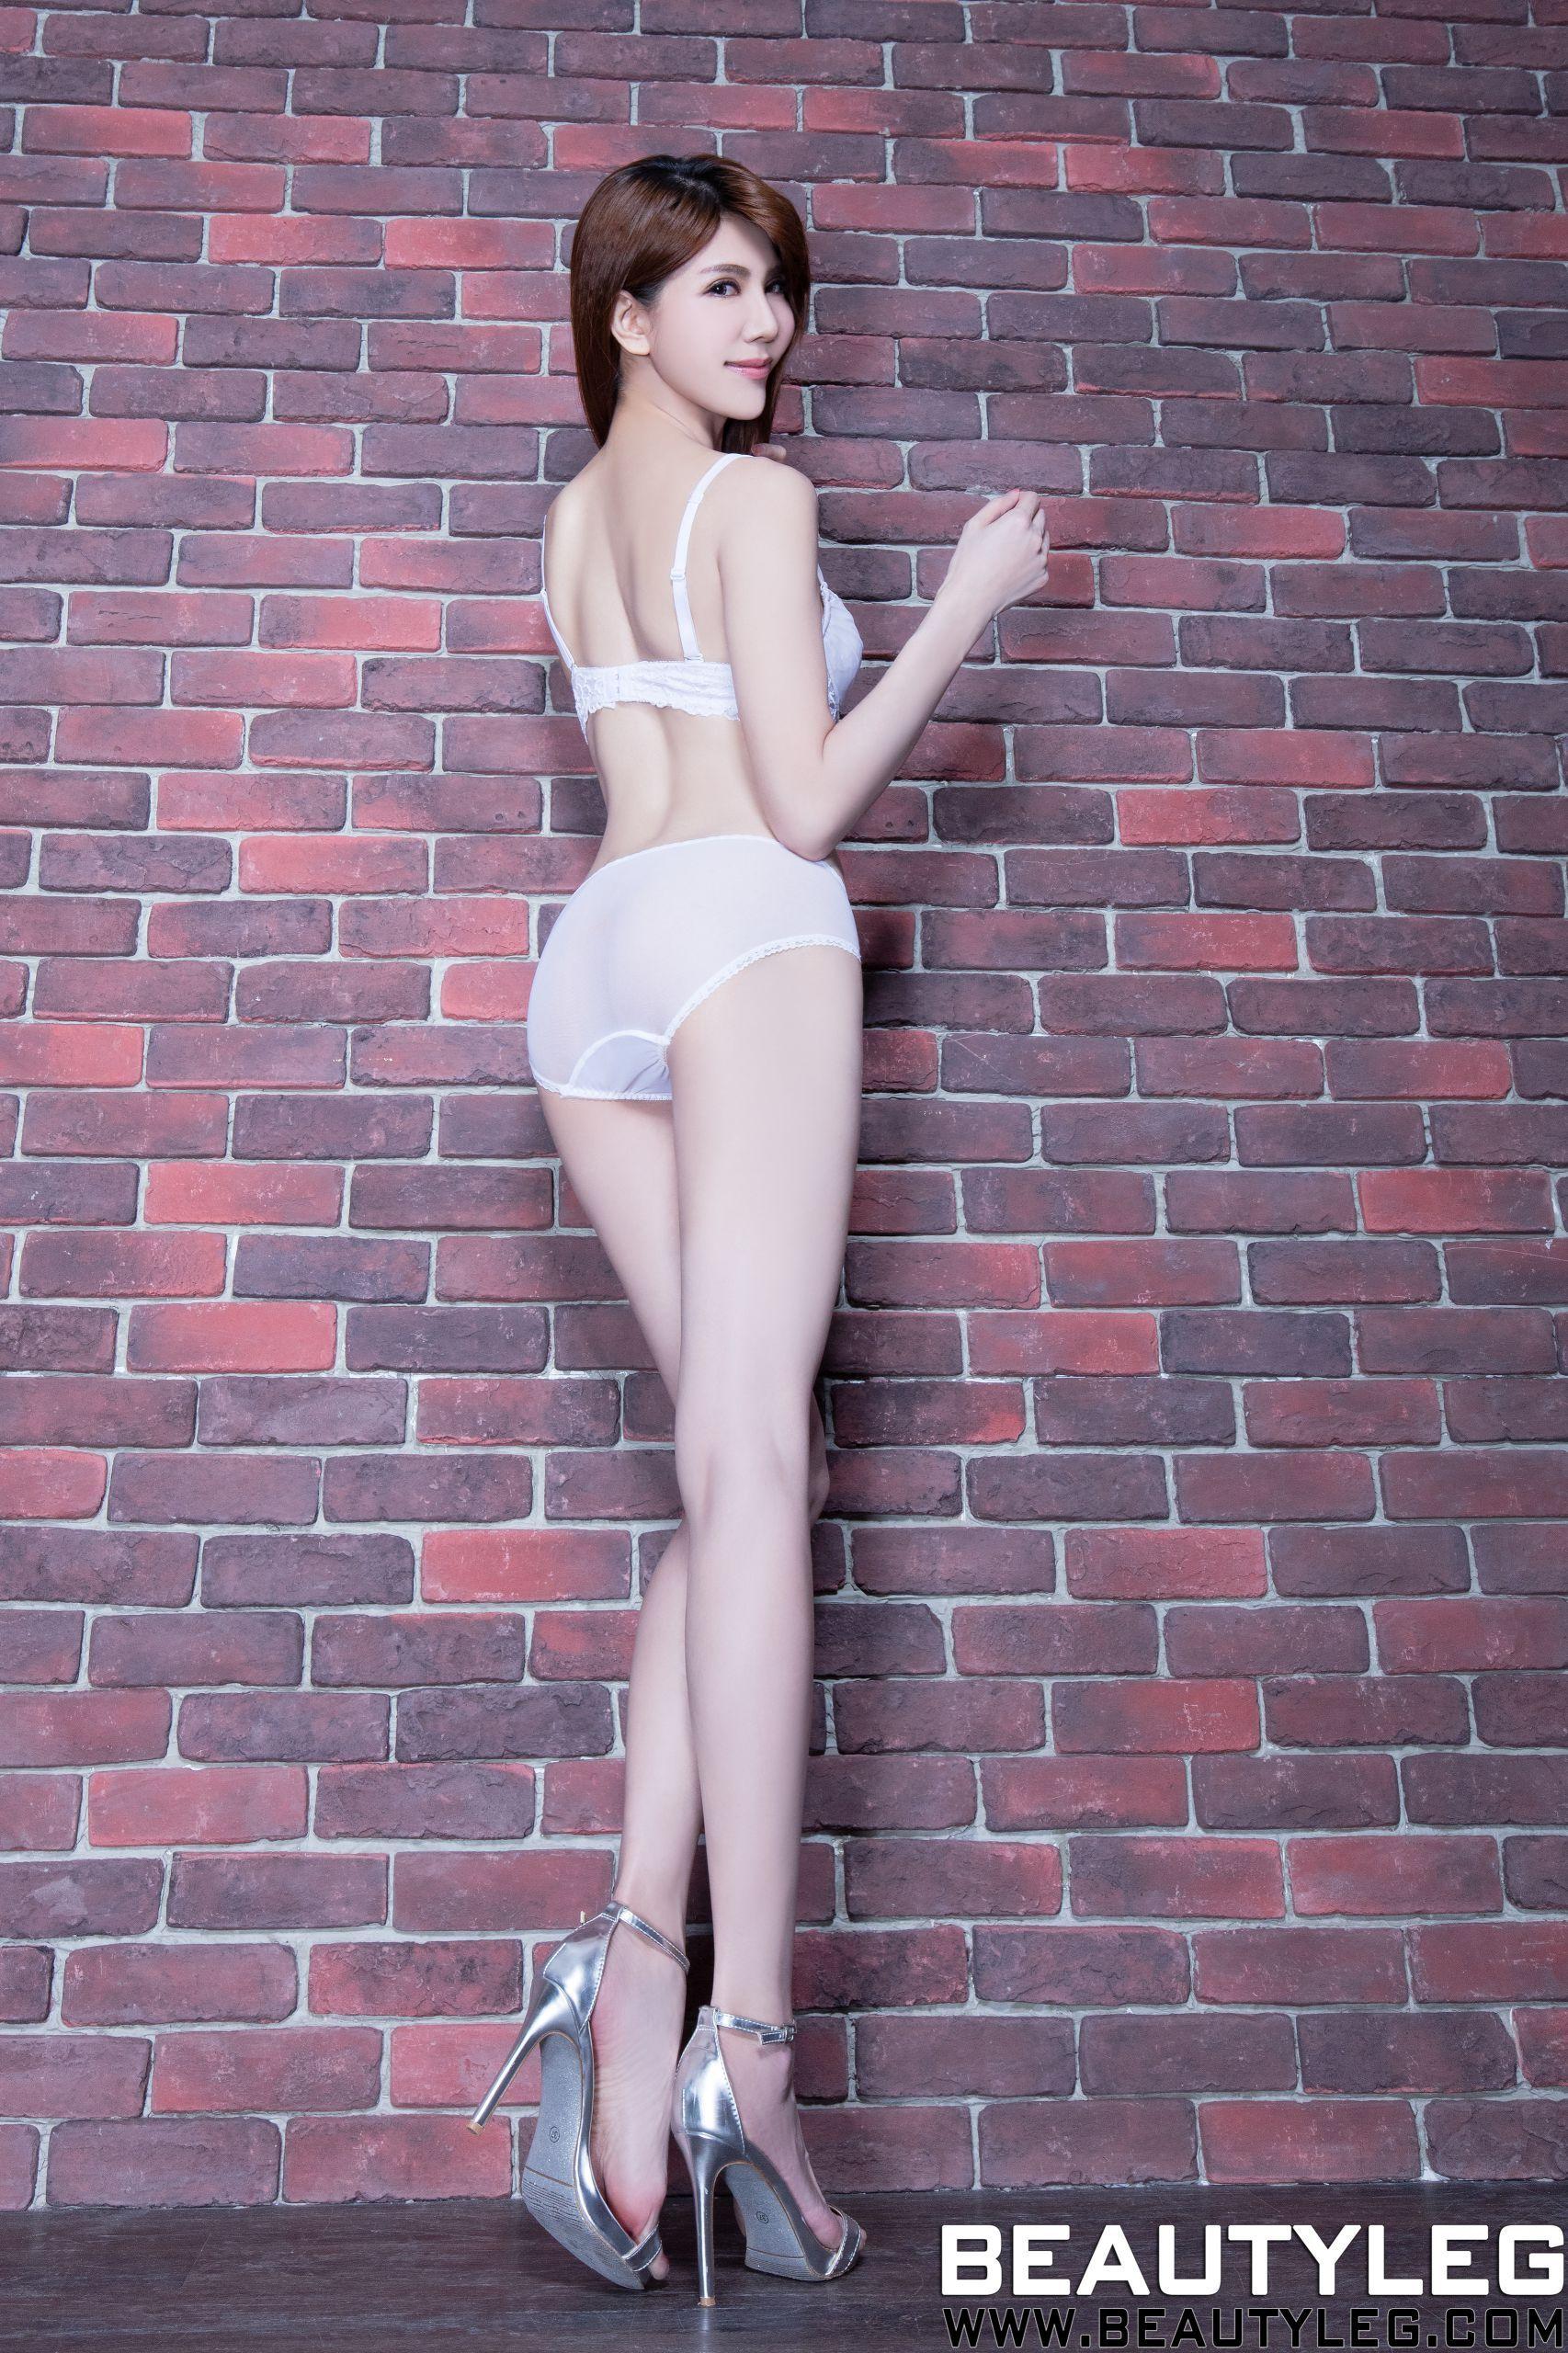 27b6640a805d Beautyleg美腿写真] No.1418 Maggie 超短裙+内衣 套图第39张   セレブ ...